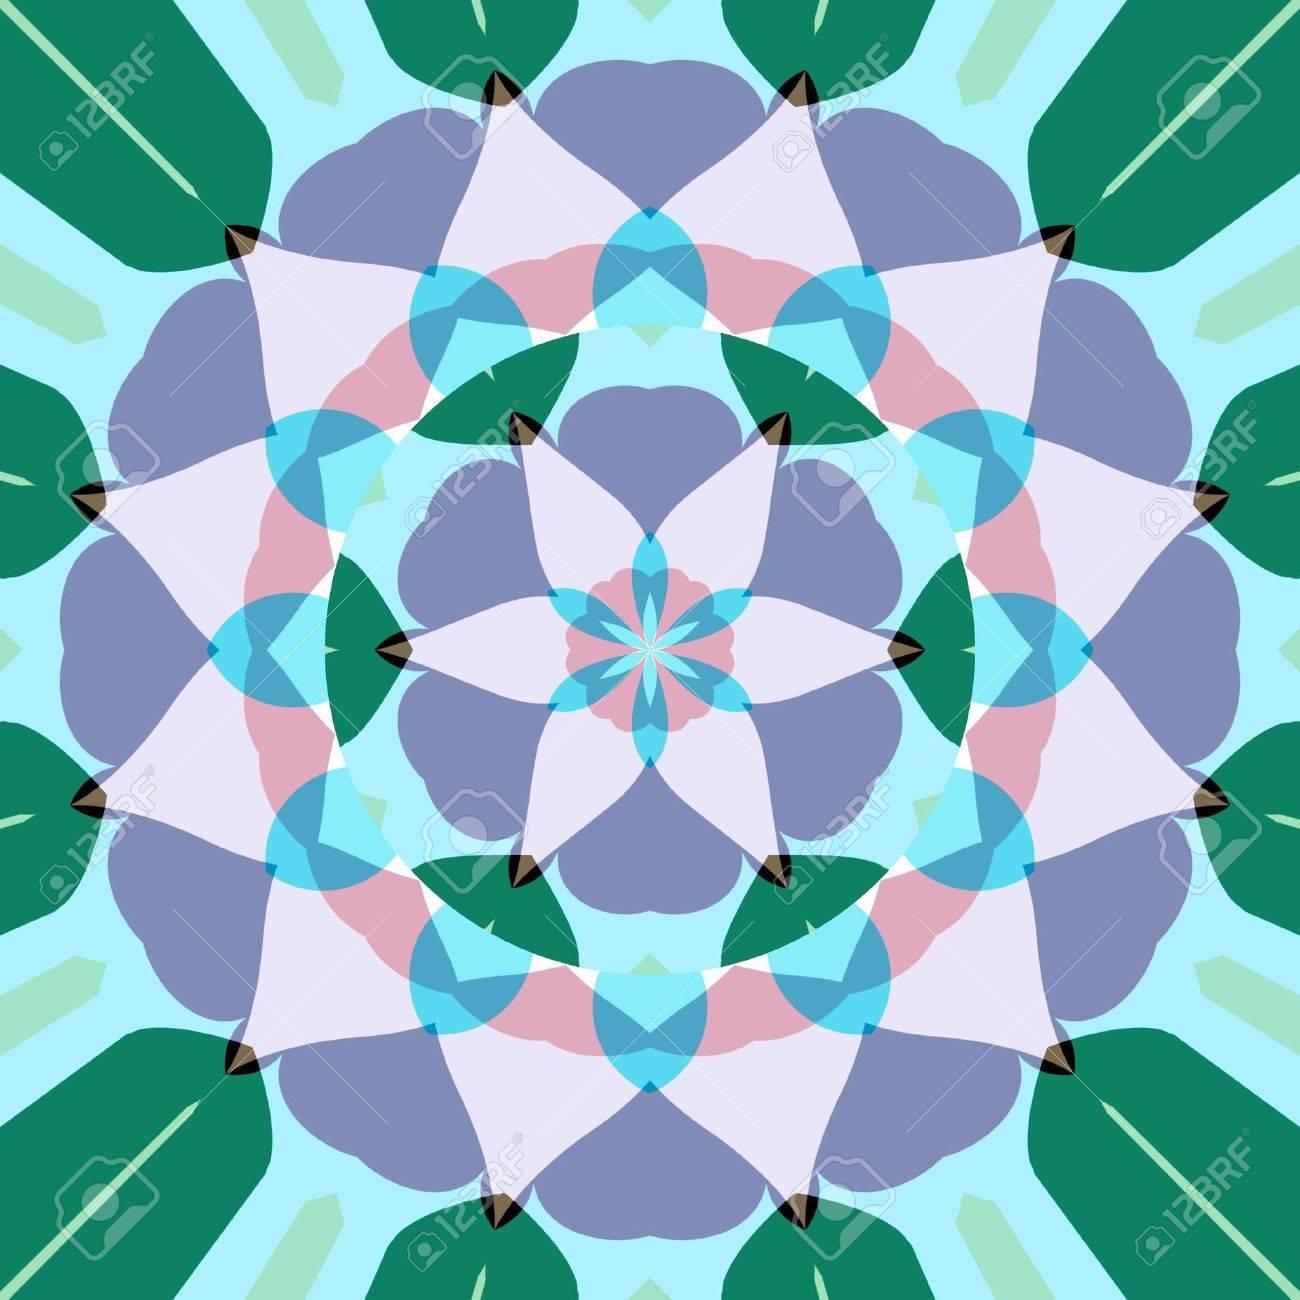 Abstract Mandala Like Pastel Colored Symmetric Lotus Flower Shape